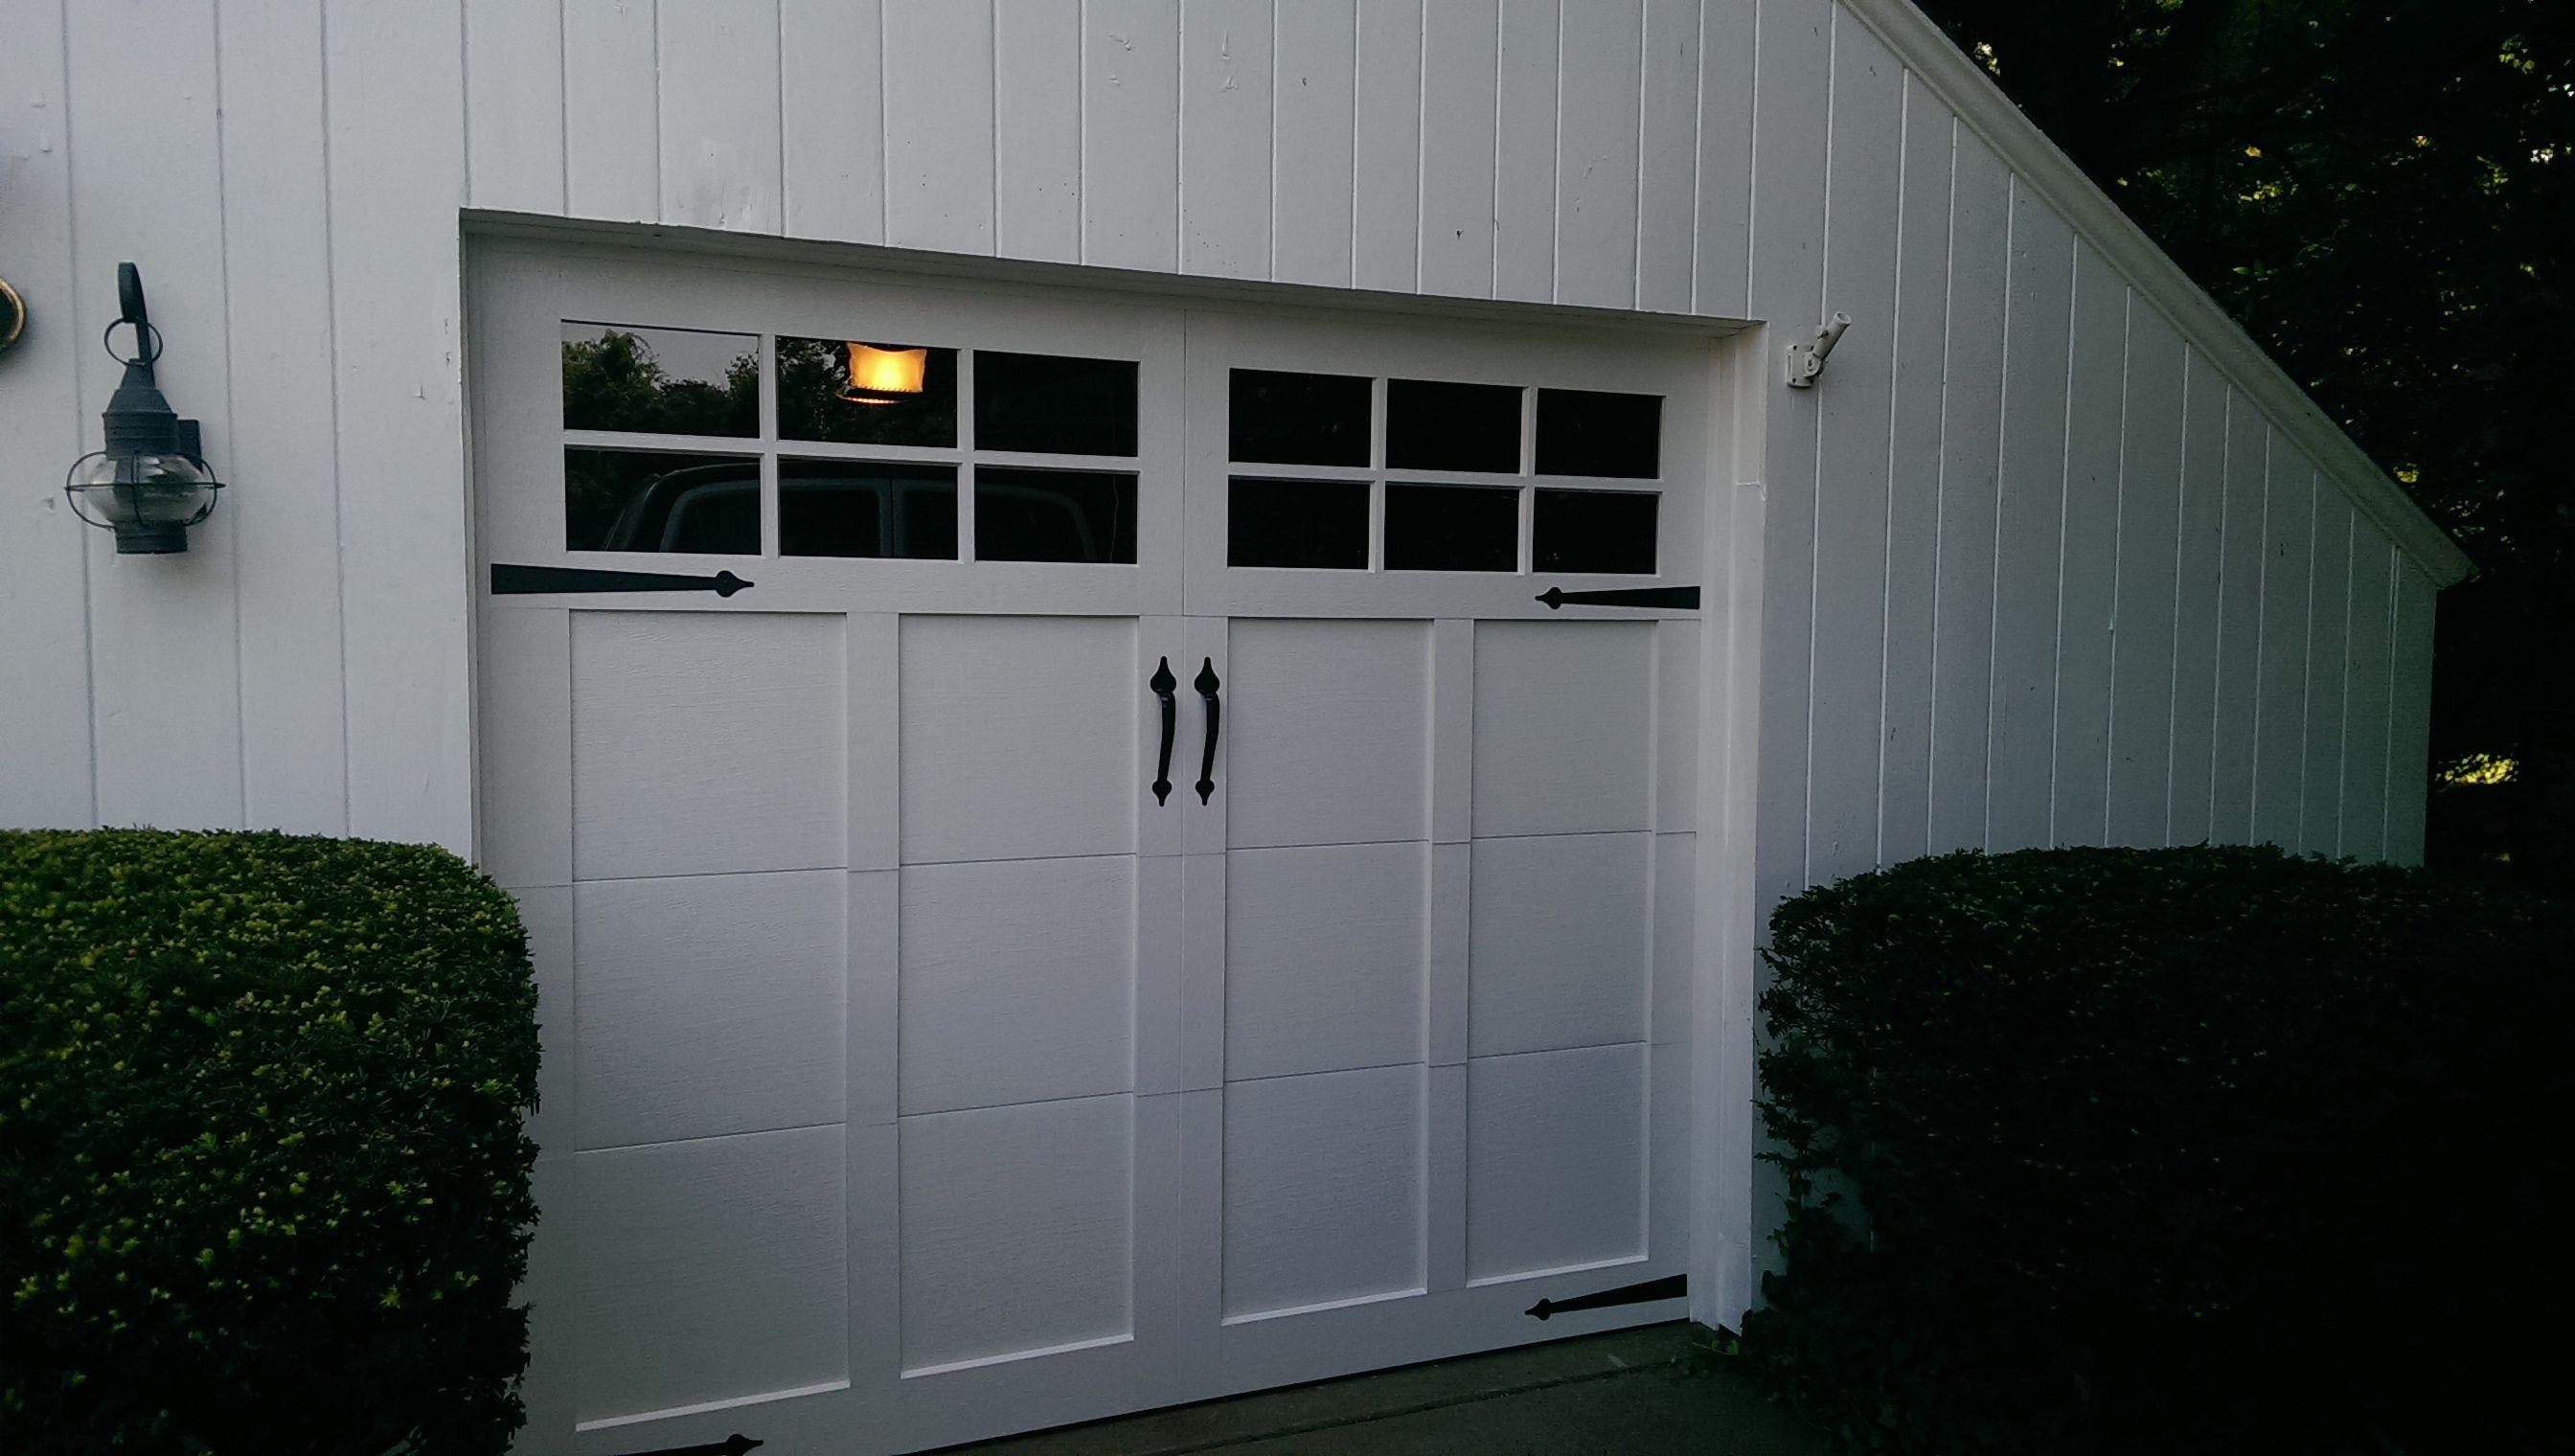 ... Carriage House Garage Doors In White With 6 Pane Glass U0026 Flat Black  Spade Decorative Hardware. Installed By Mortland Overhead Door.  Mortlanddoor.com